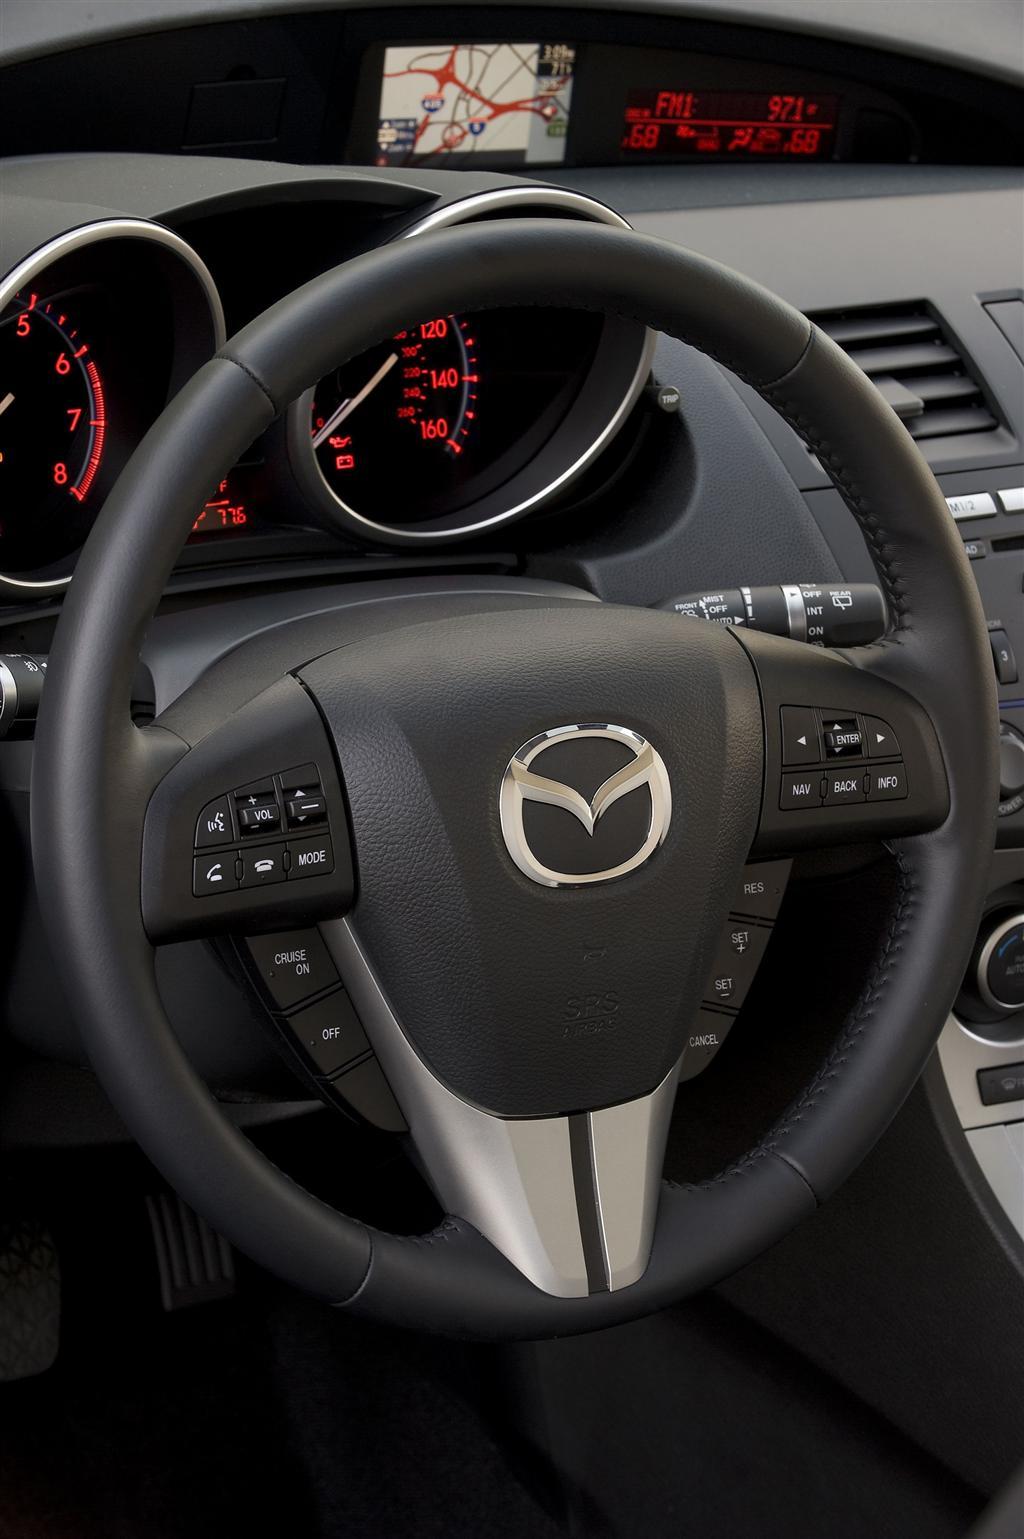 2011 Mazda 3 - conceptcarz.com